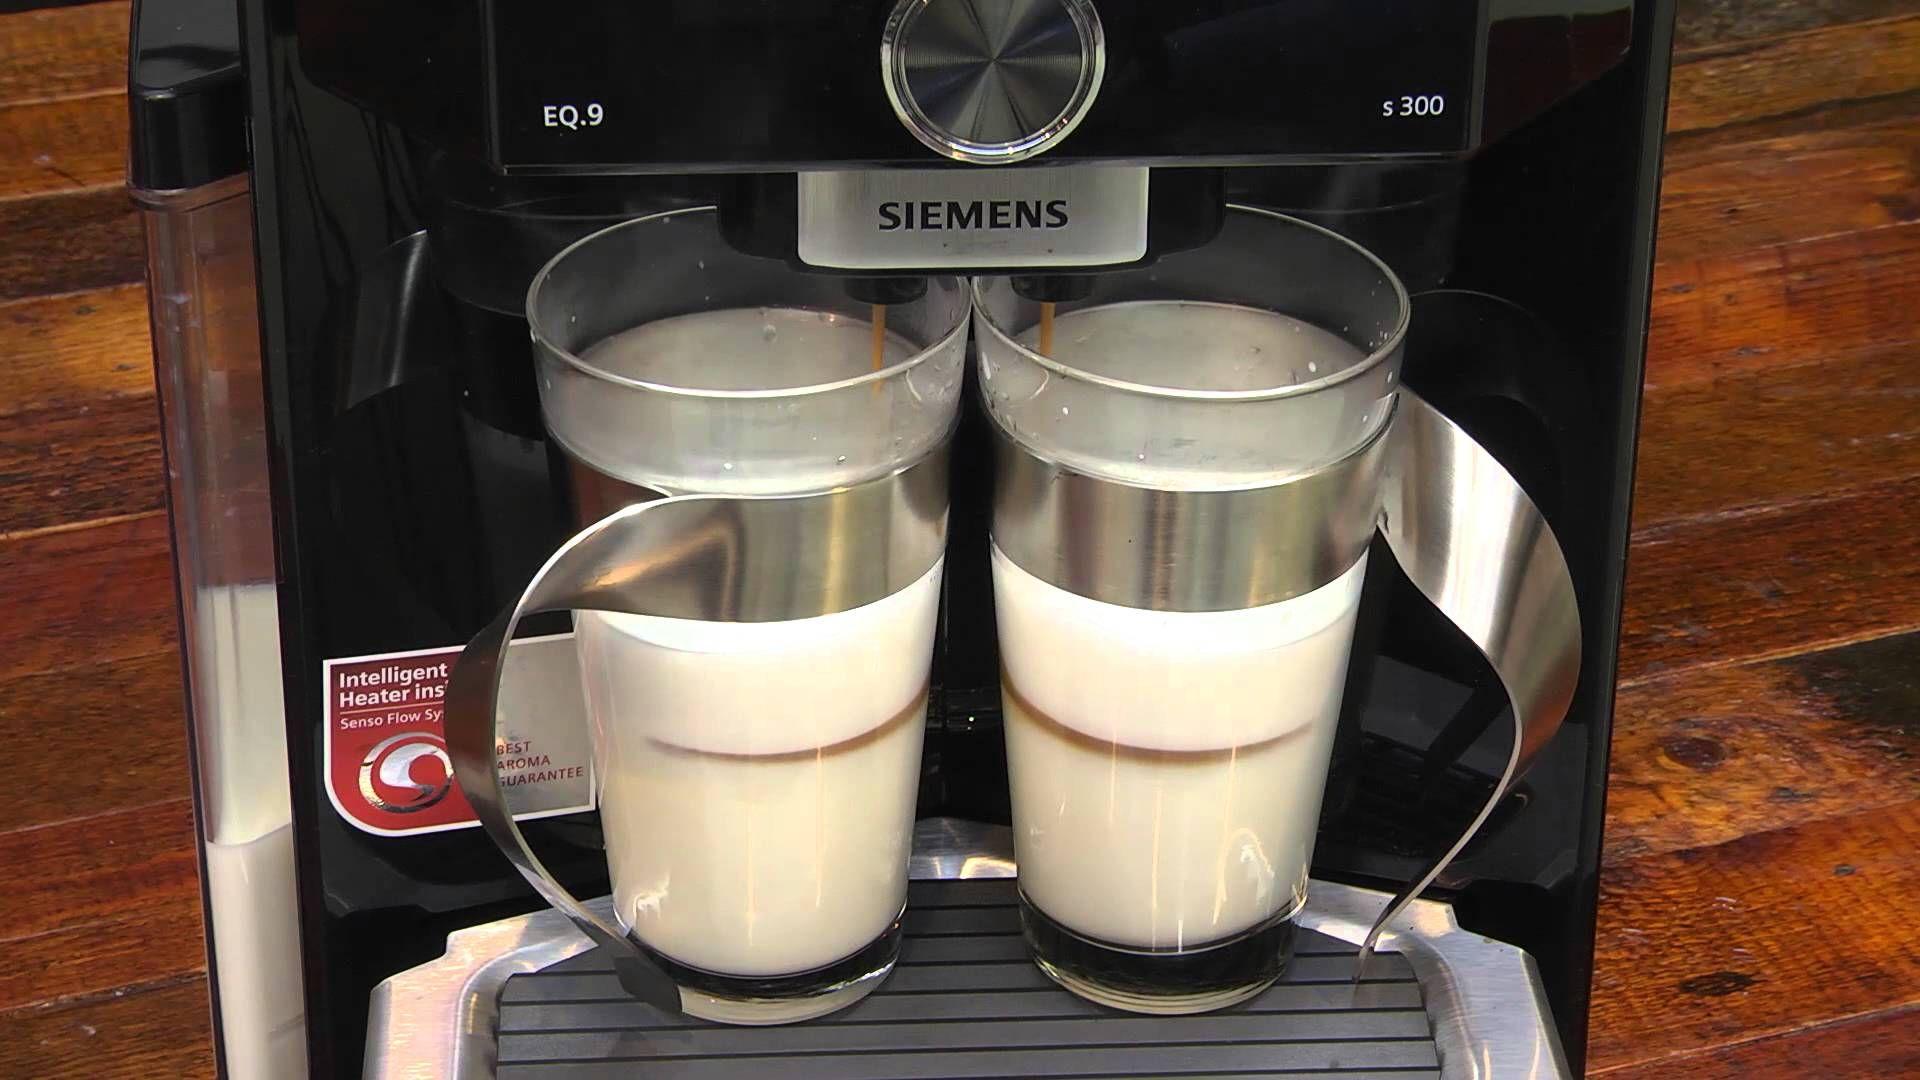 Pin Op Theekoepels Echte Koffie En Thee